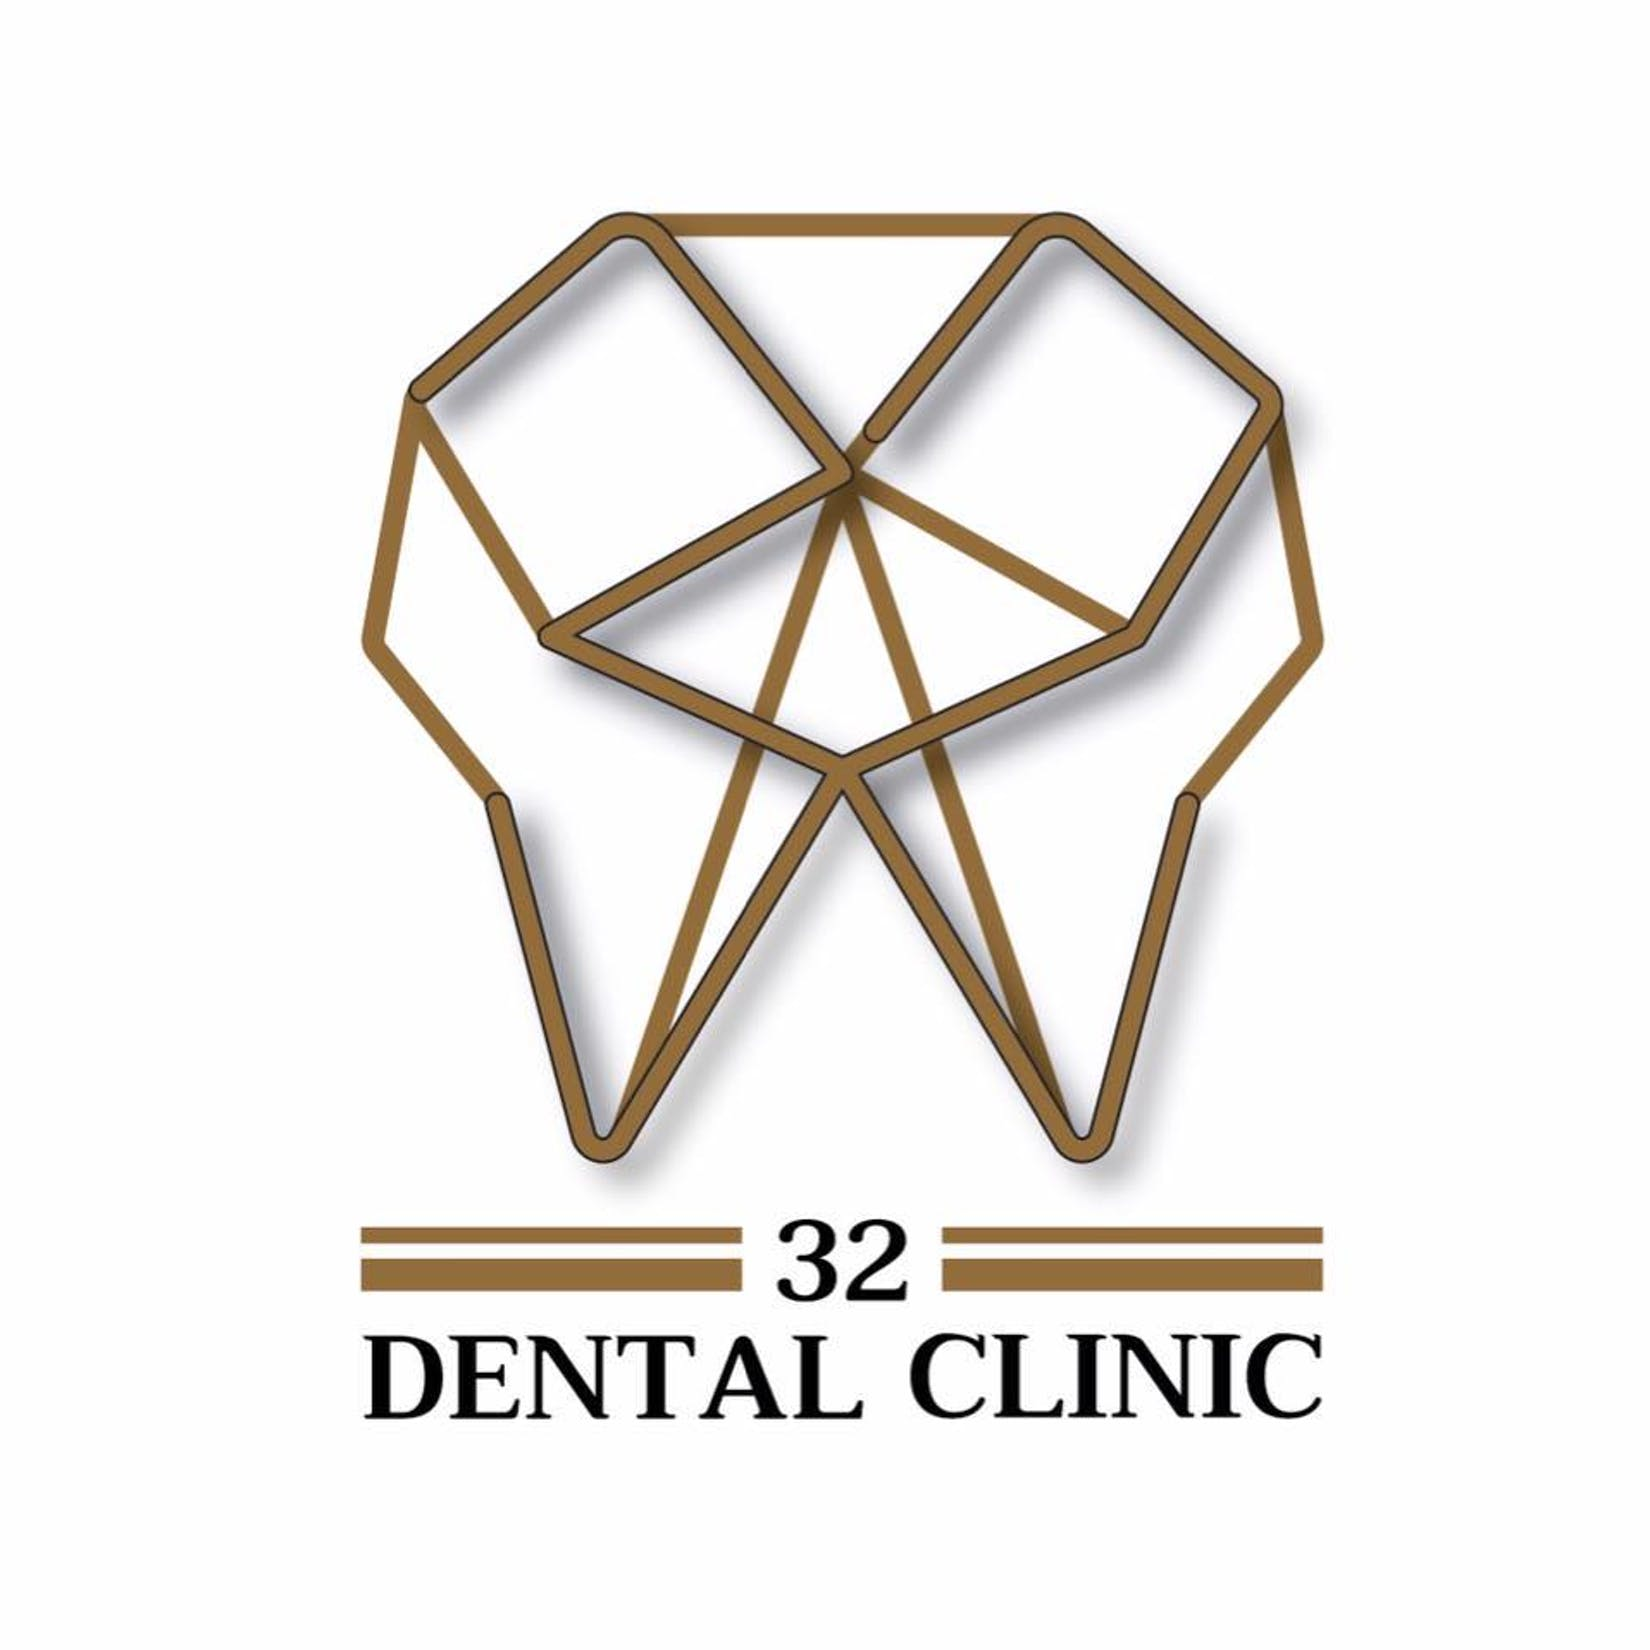 32 Dental Clinic | Medical